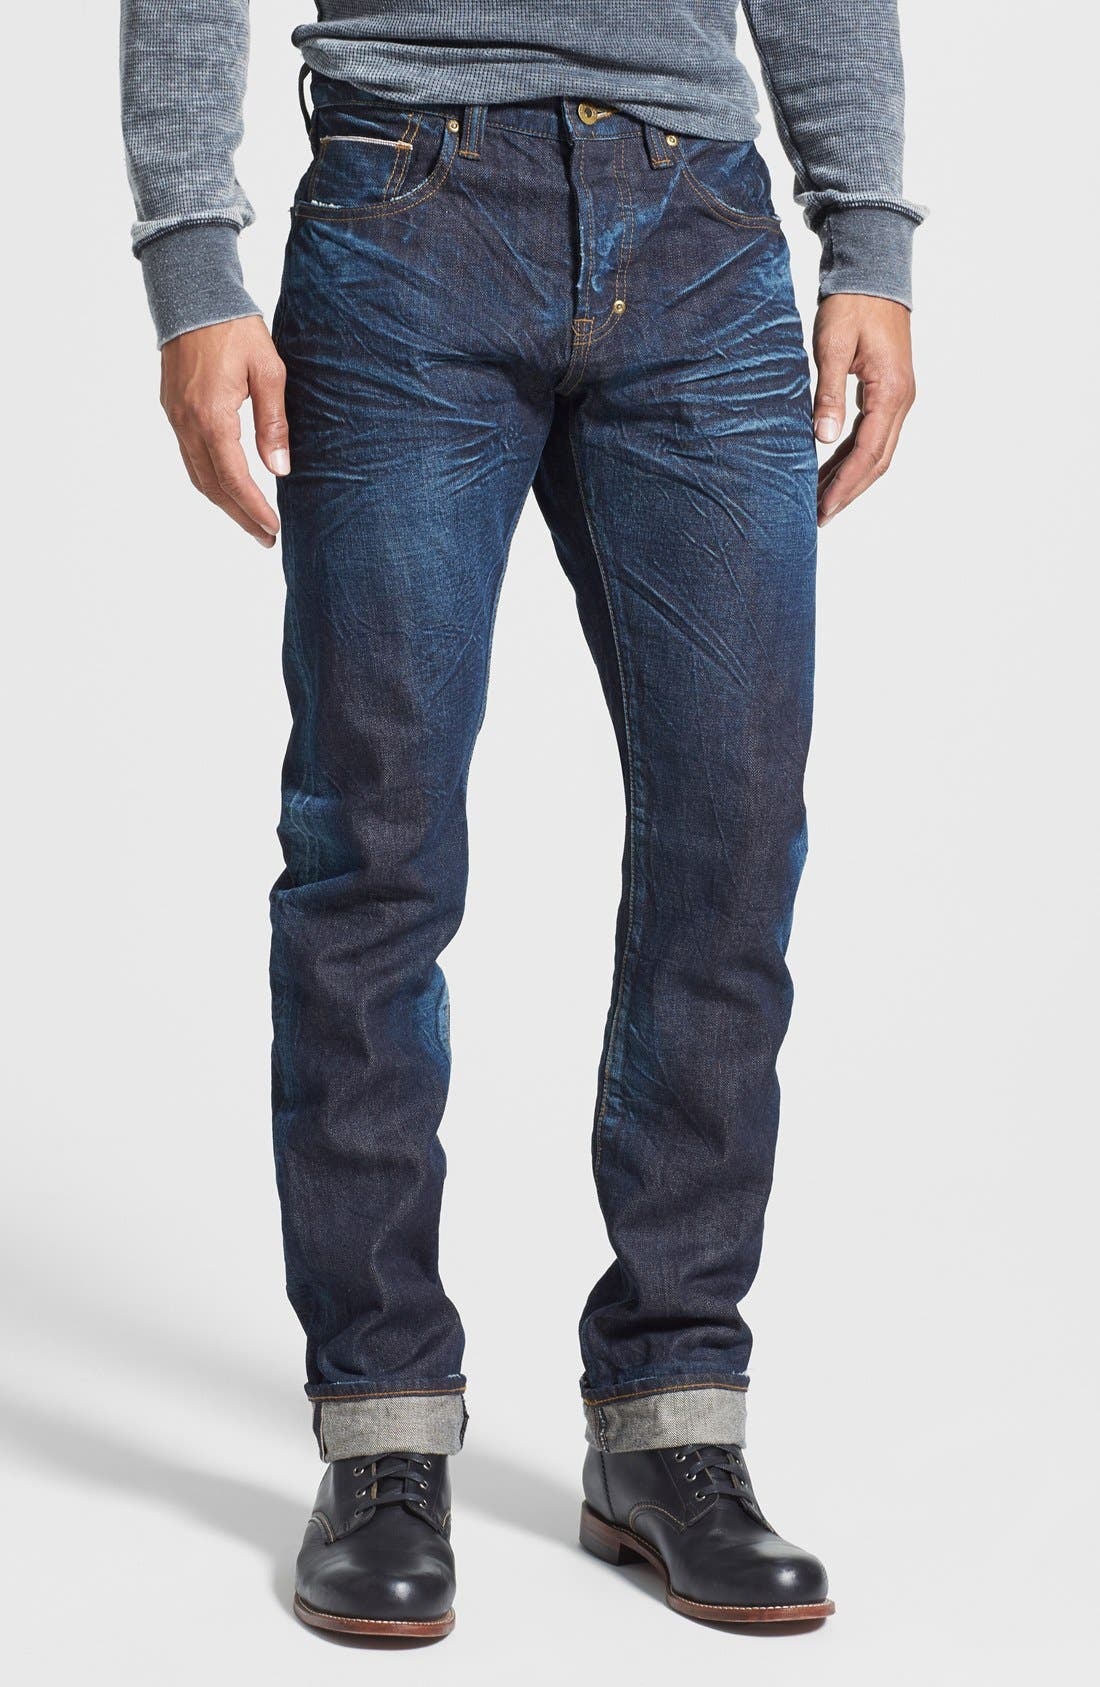 'Demon' Slim Straight Leg Selvedge Jeans,                         Main,                         color, 6 Month Wash